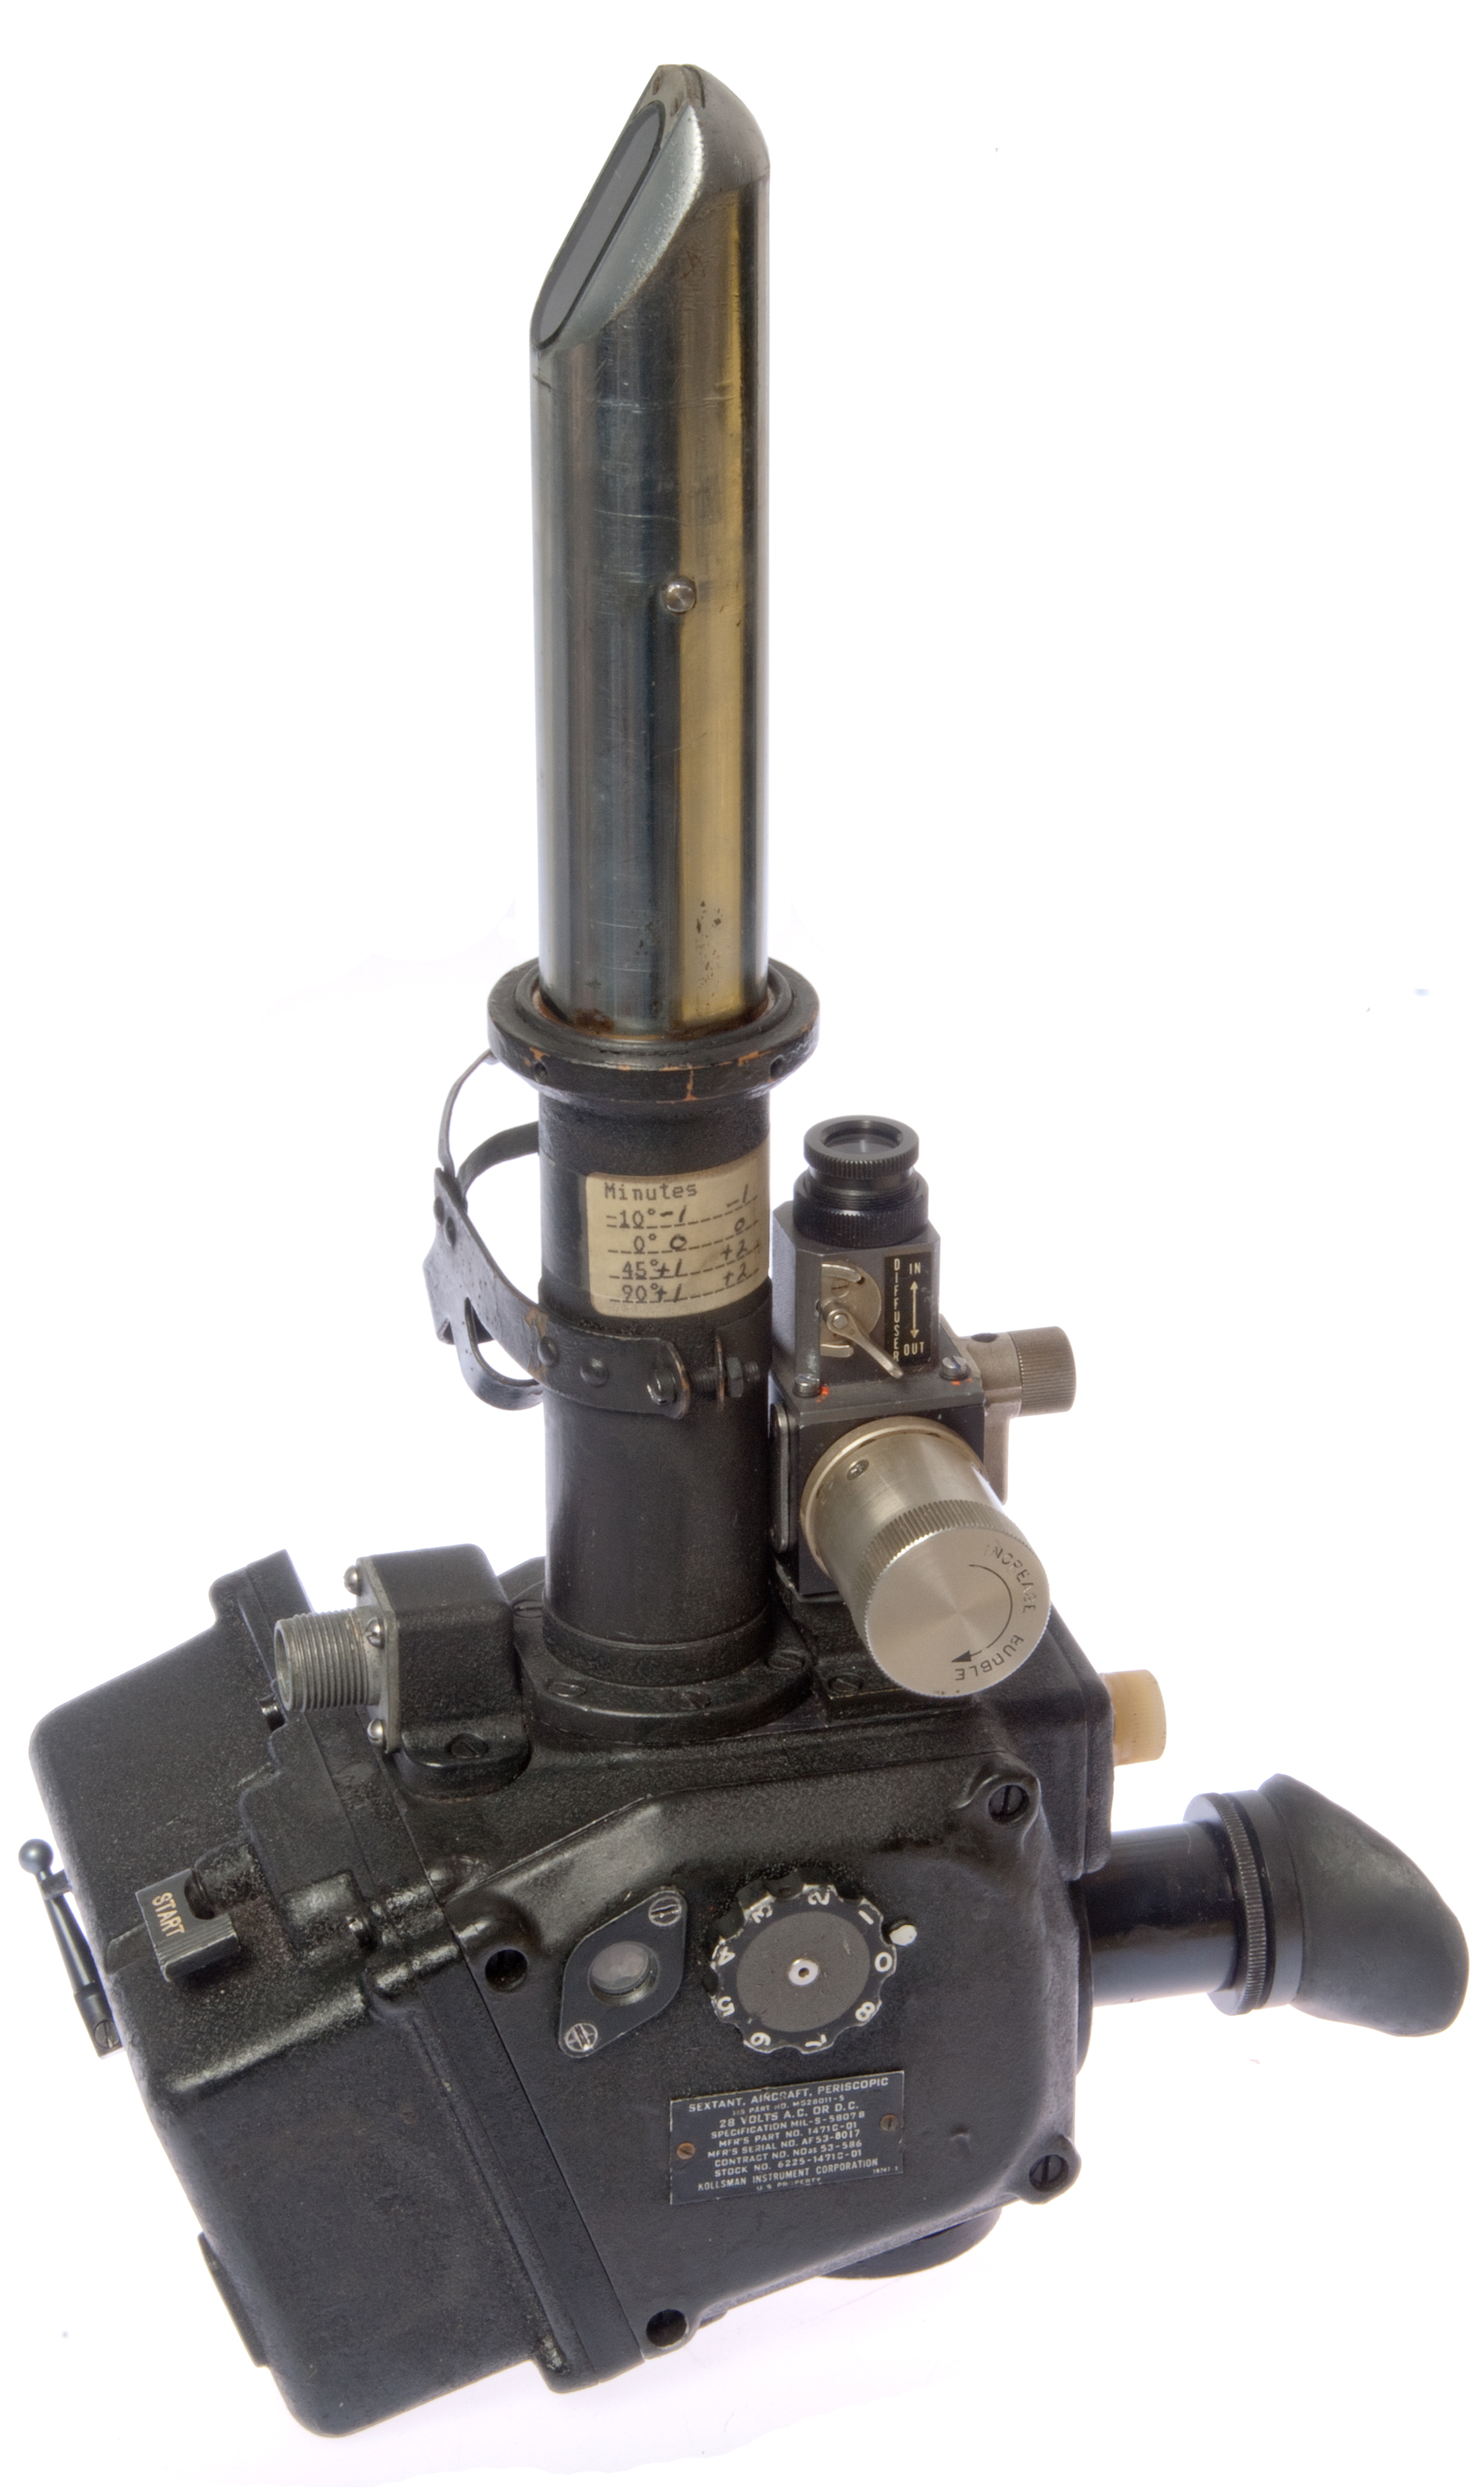 kollsman sextant ma-1